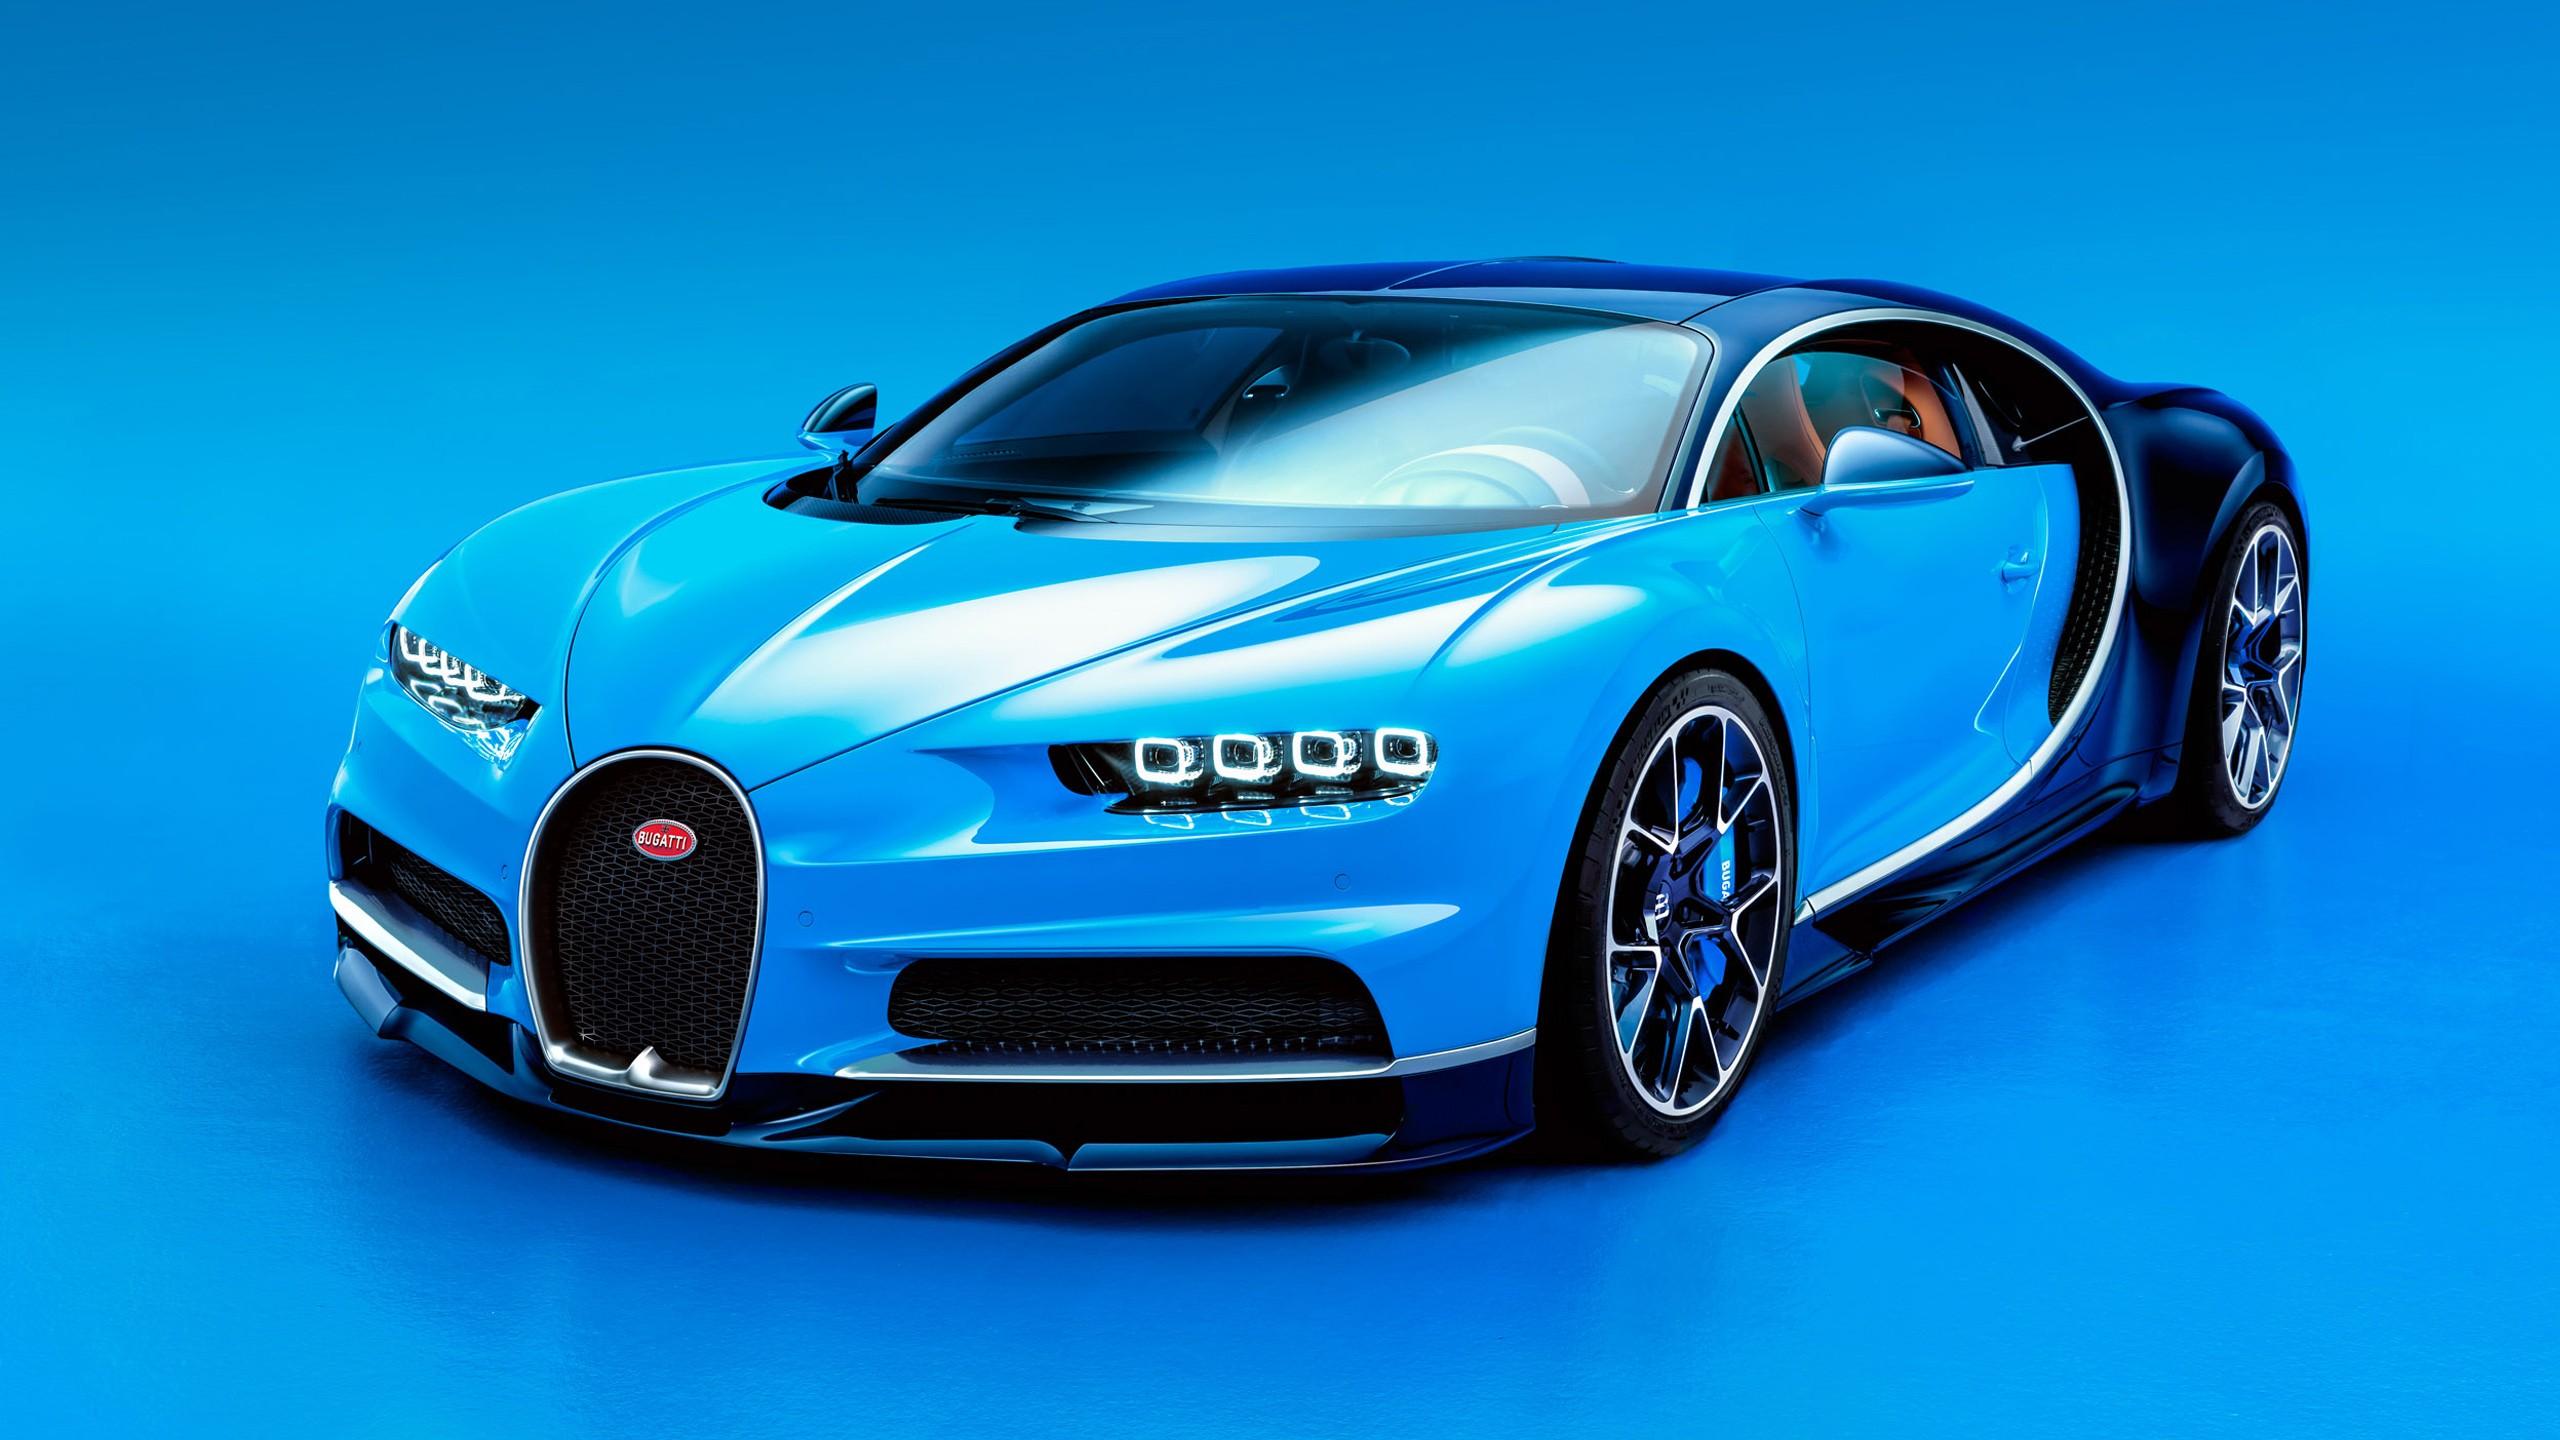 Mclaren Iphone Wallpaper 2016 Bugatti Chiron Wallpaper Hd Car Wallpapers Id 6280